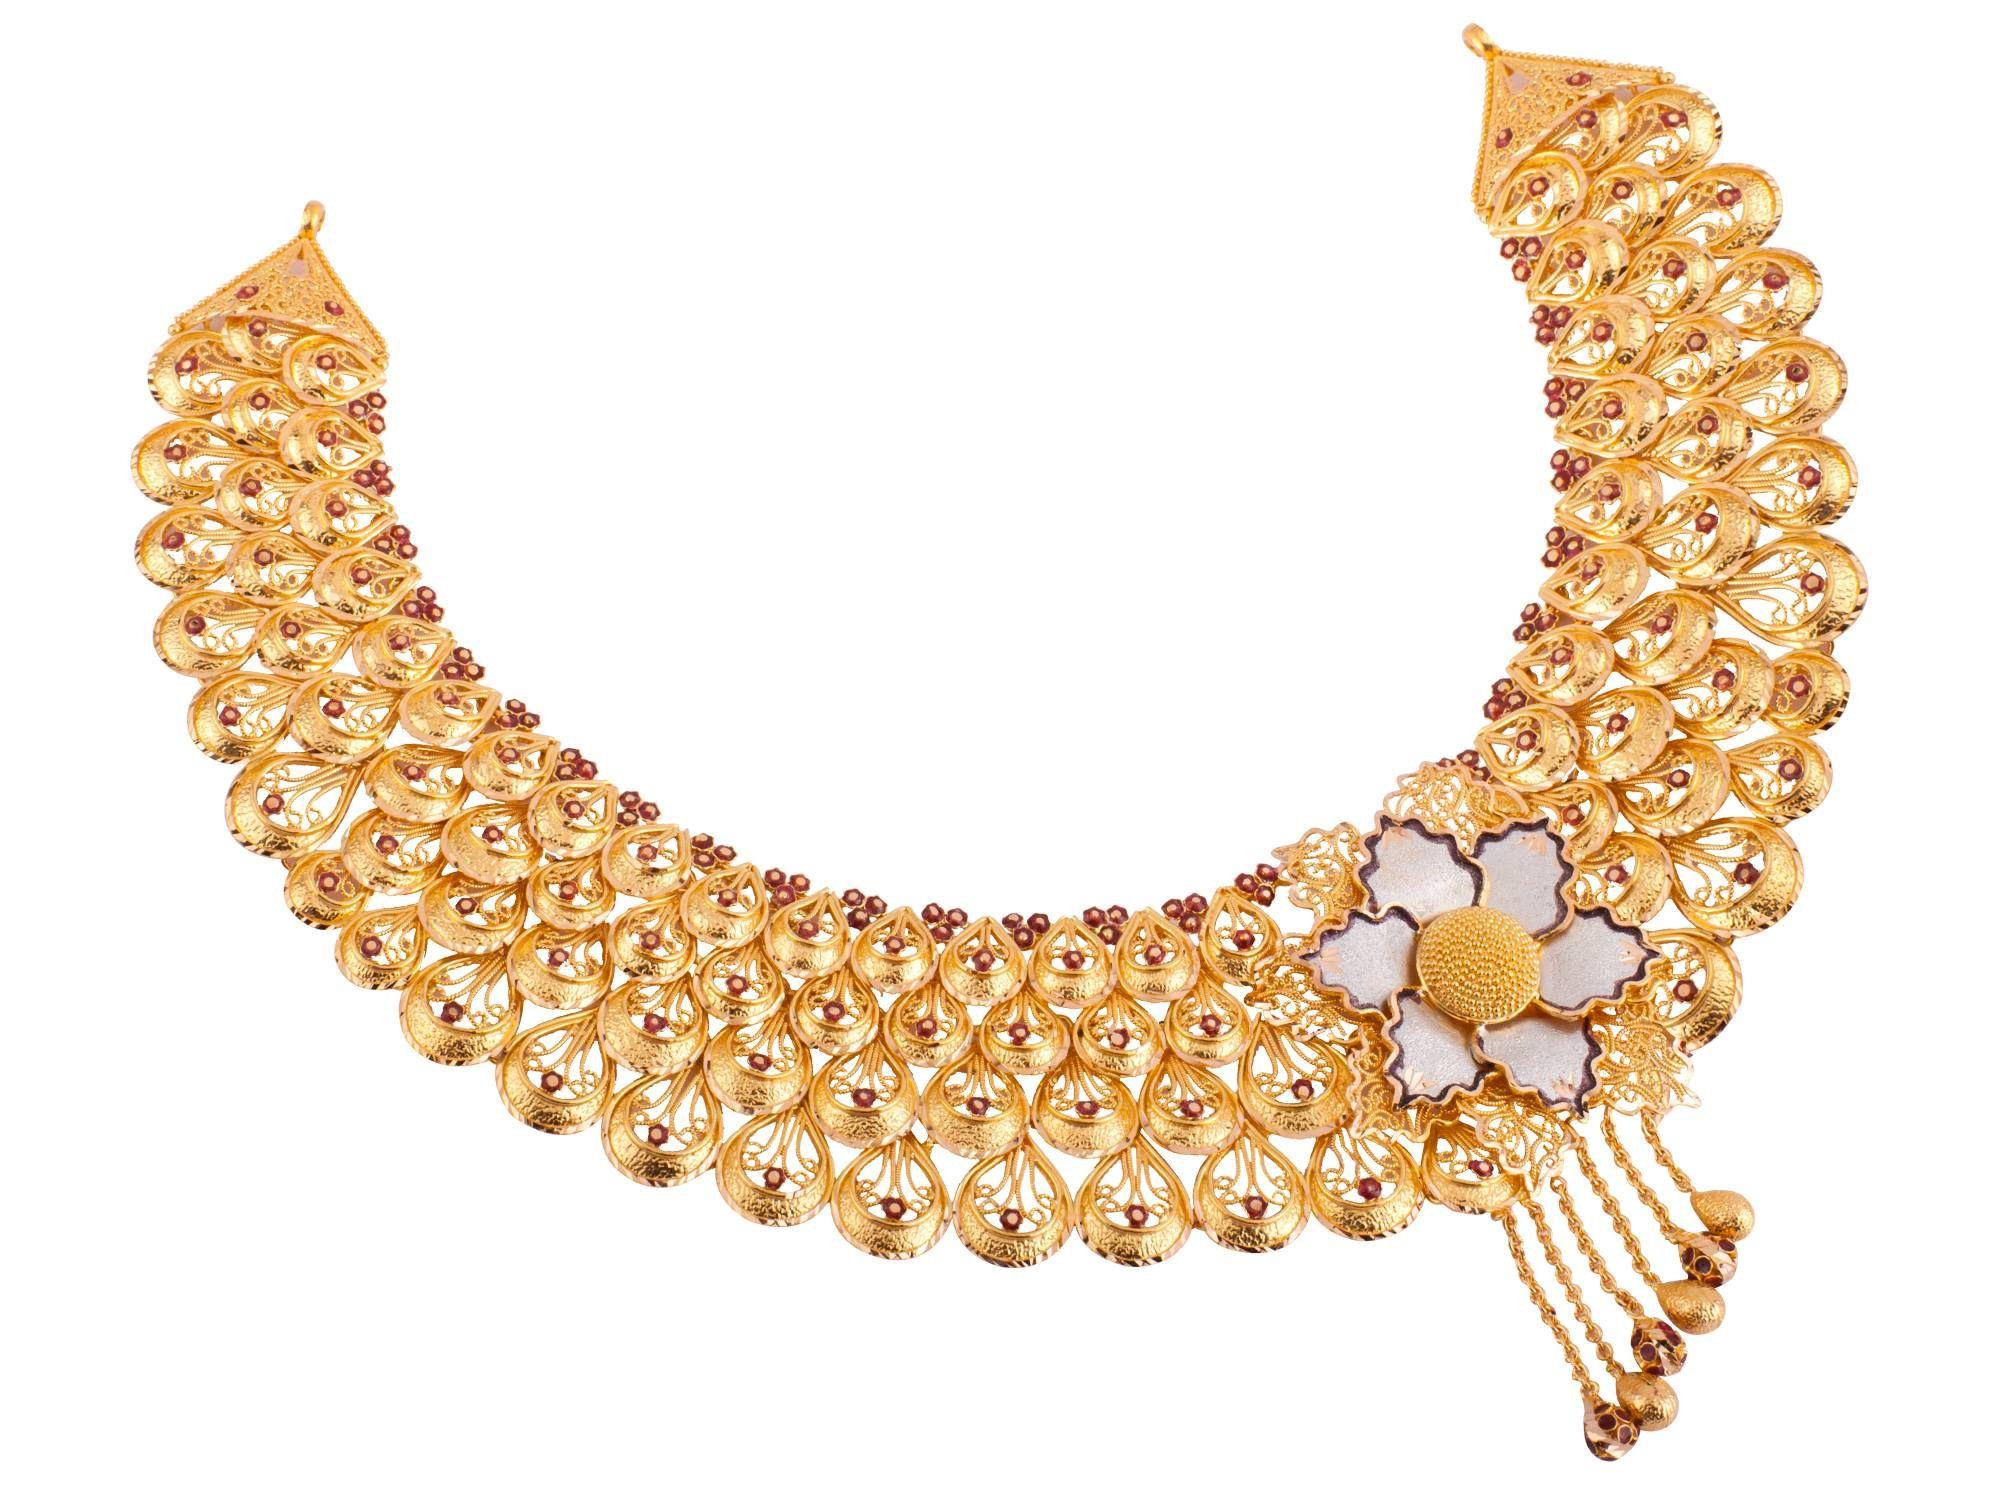 senco gold bangle - Google Search | jewellery | Pinterest | Gold ...